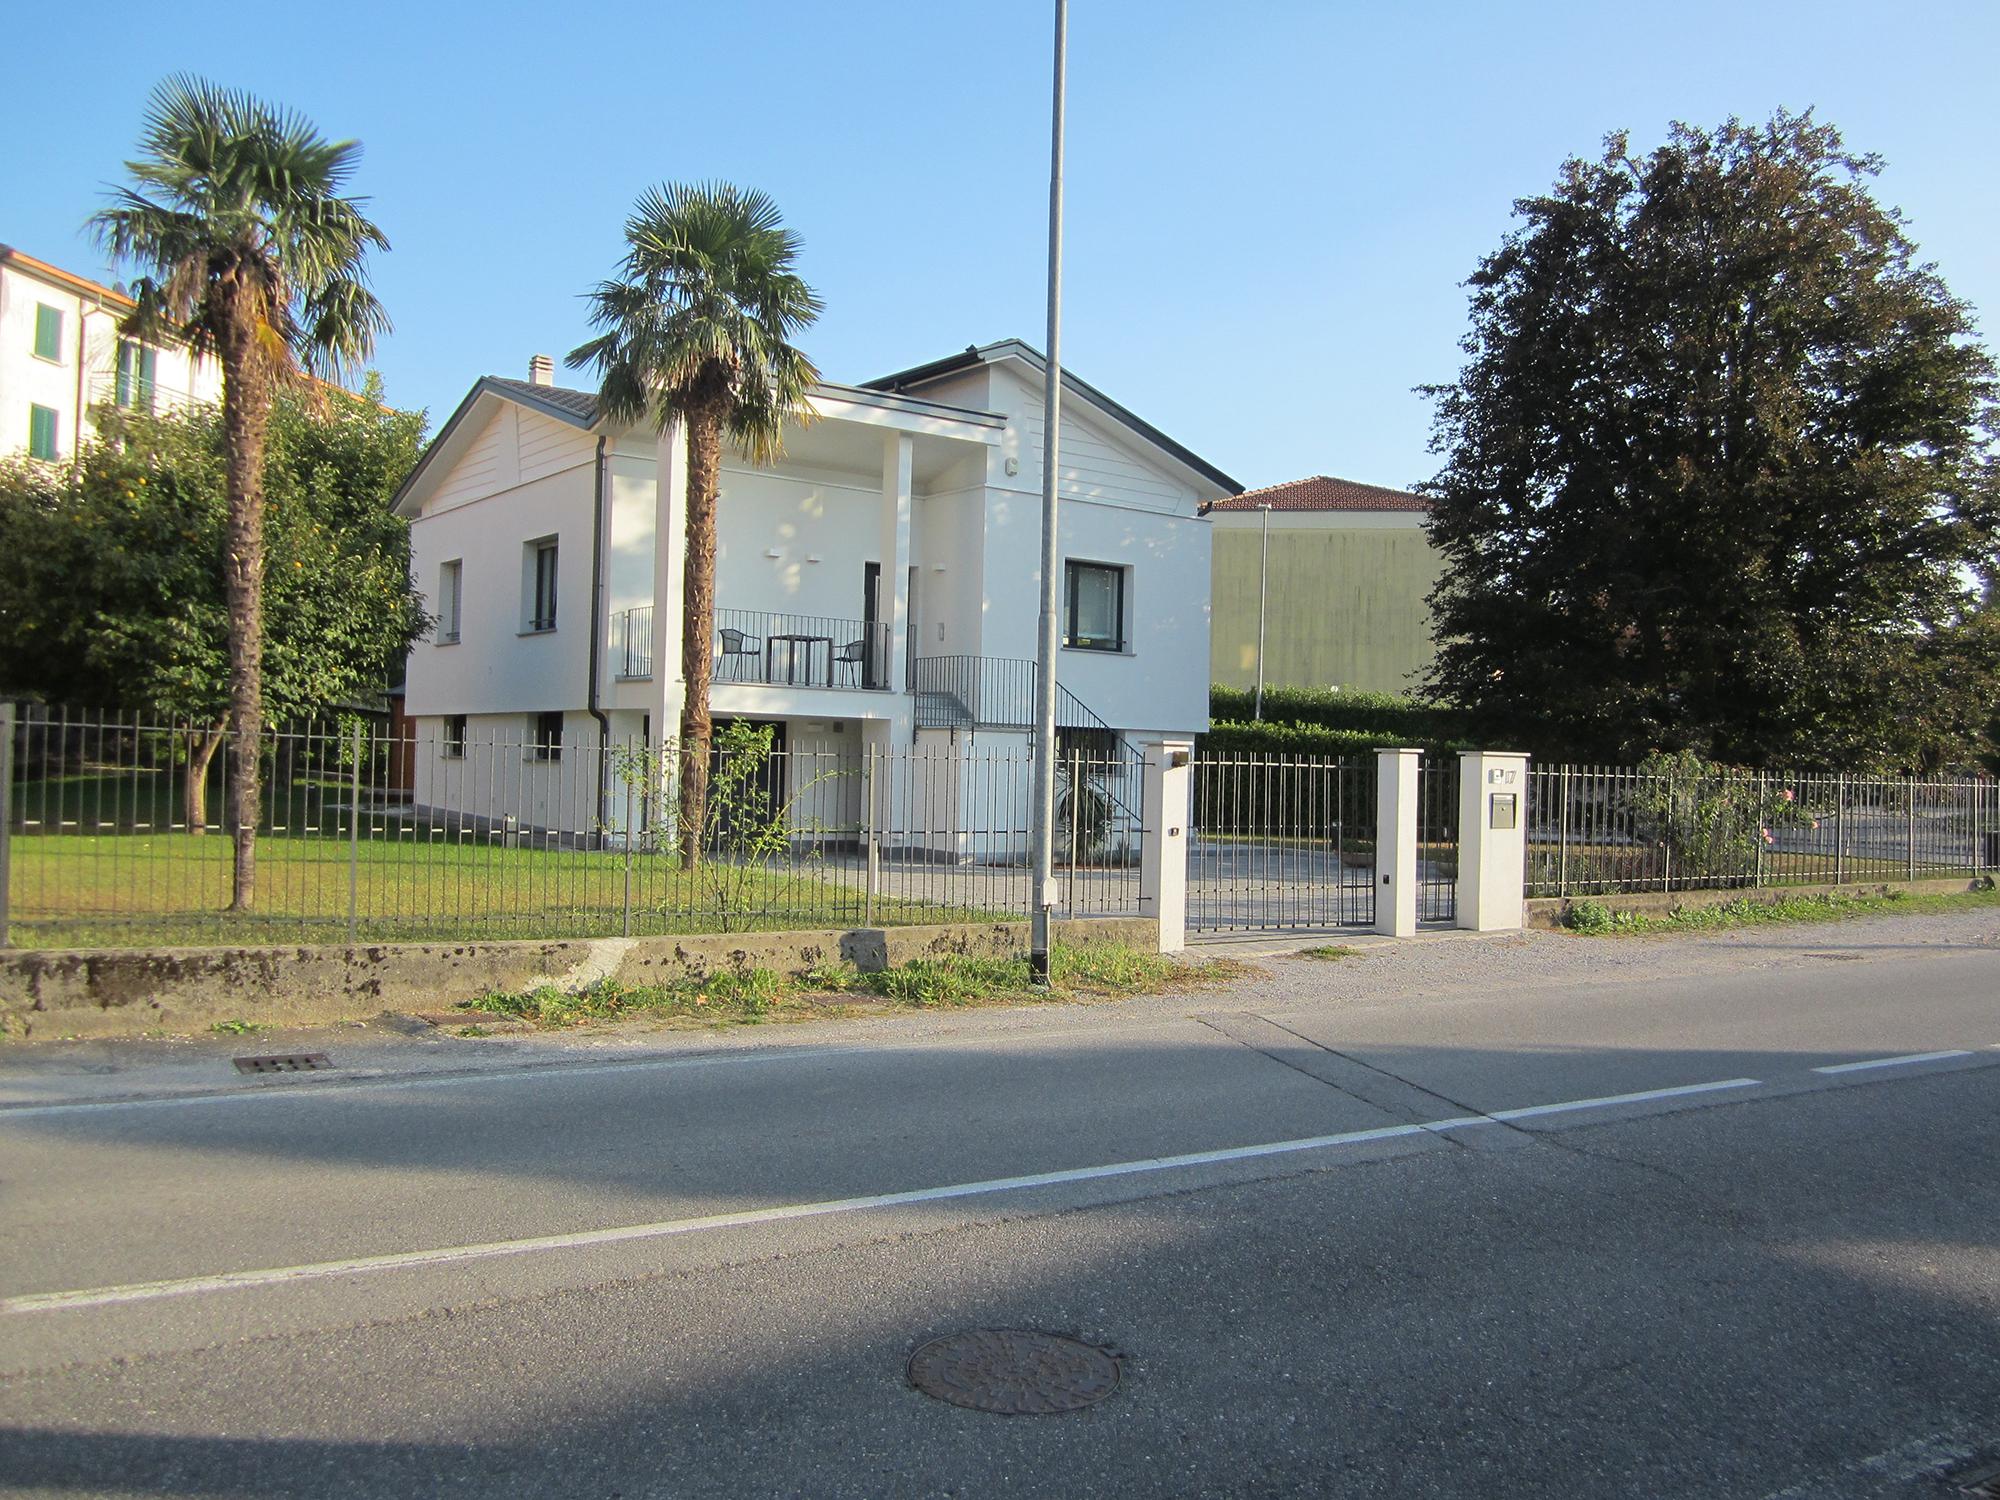 umberto_mauri_architetto_mauri_studio_lago_pusiano_como_bosisio_parini_private_renovation_house_residential_2000_02